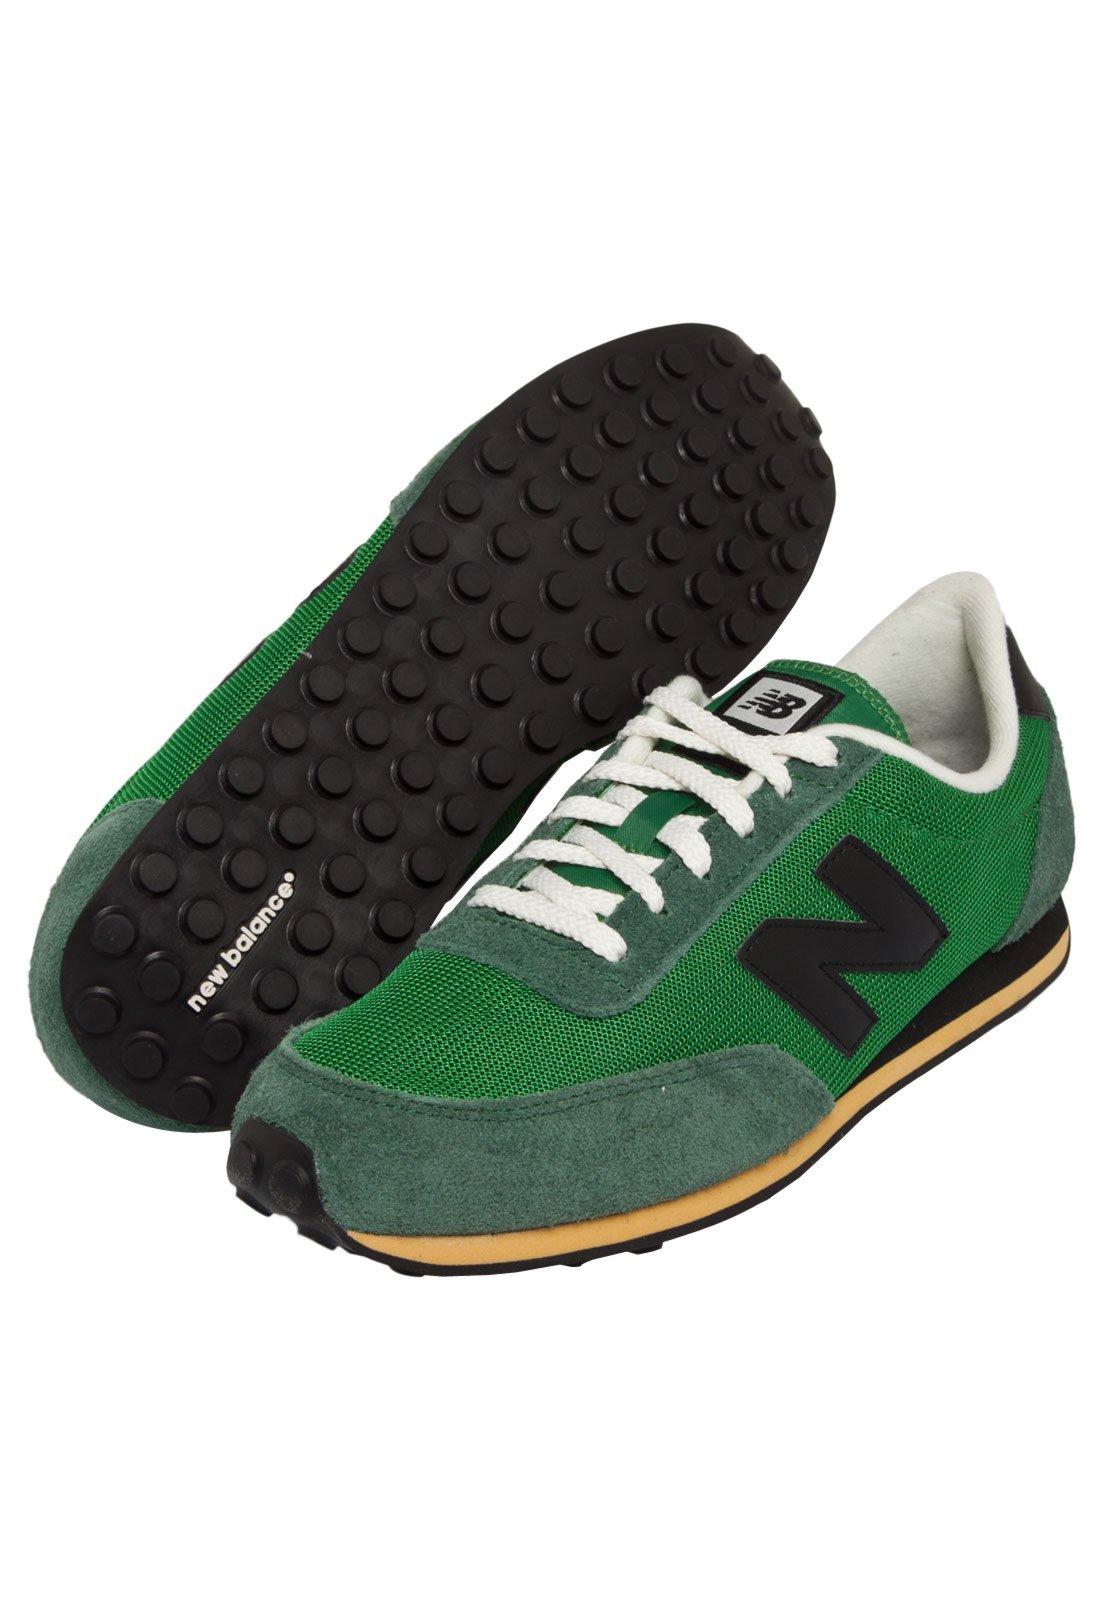 new balance 410 hombre verde